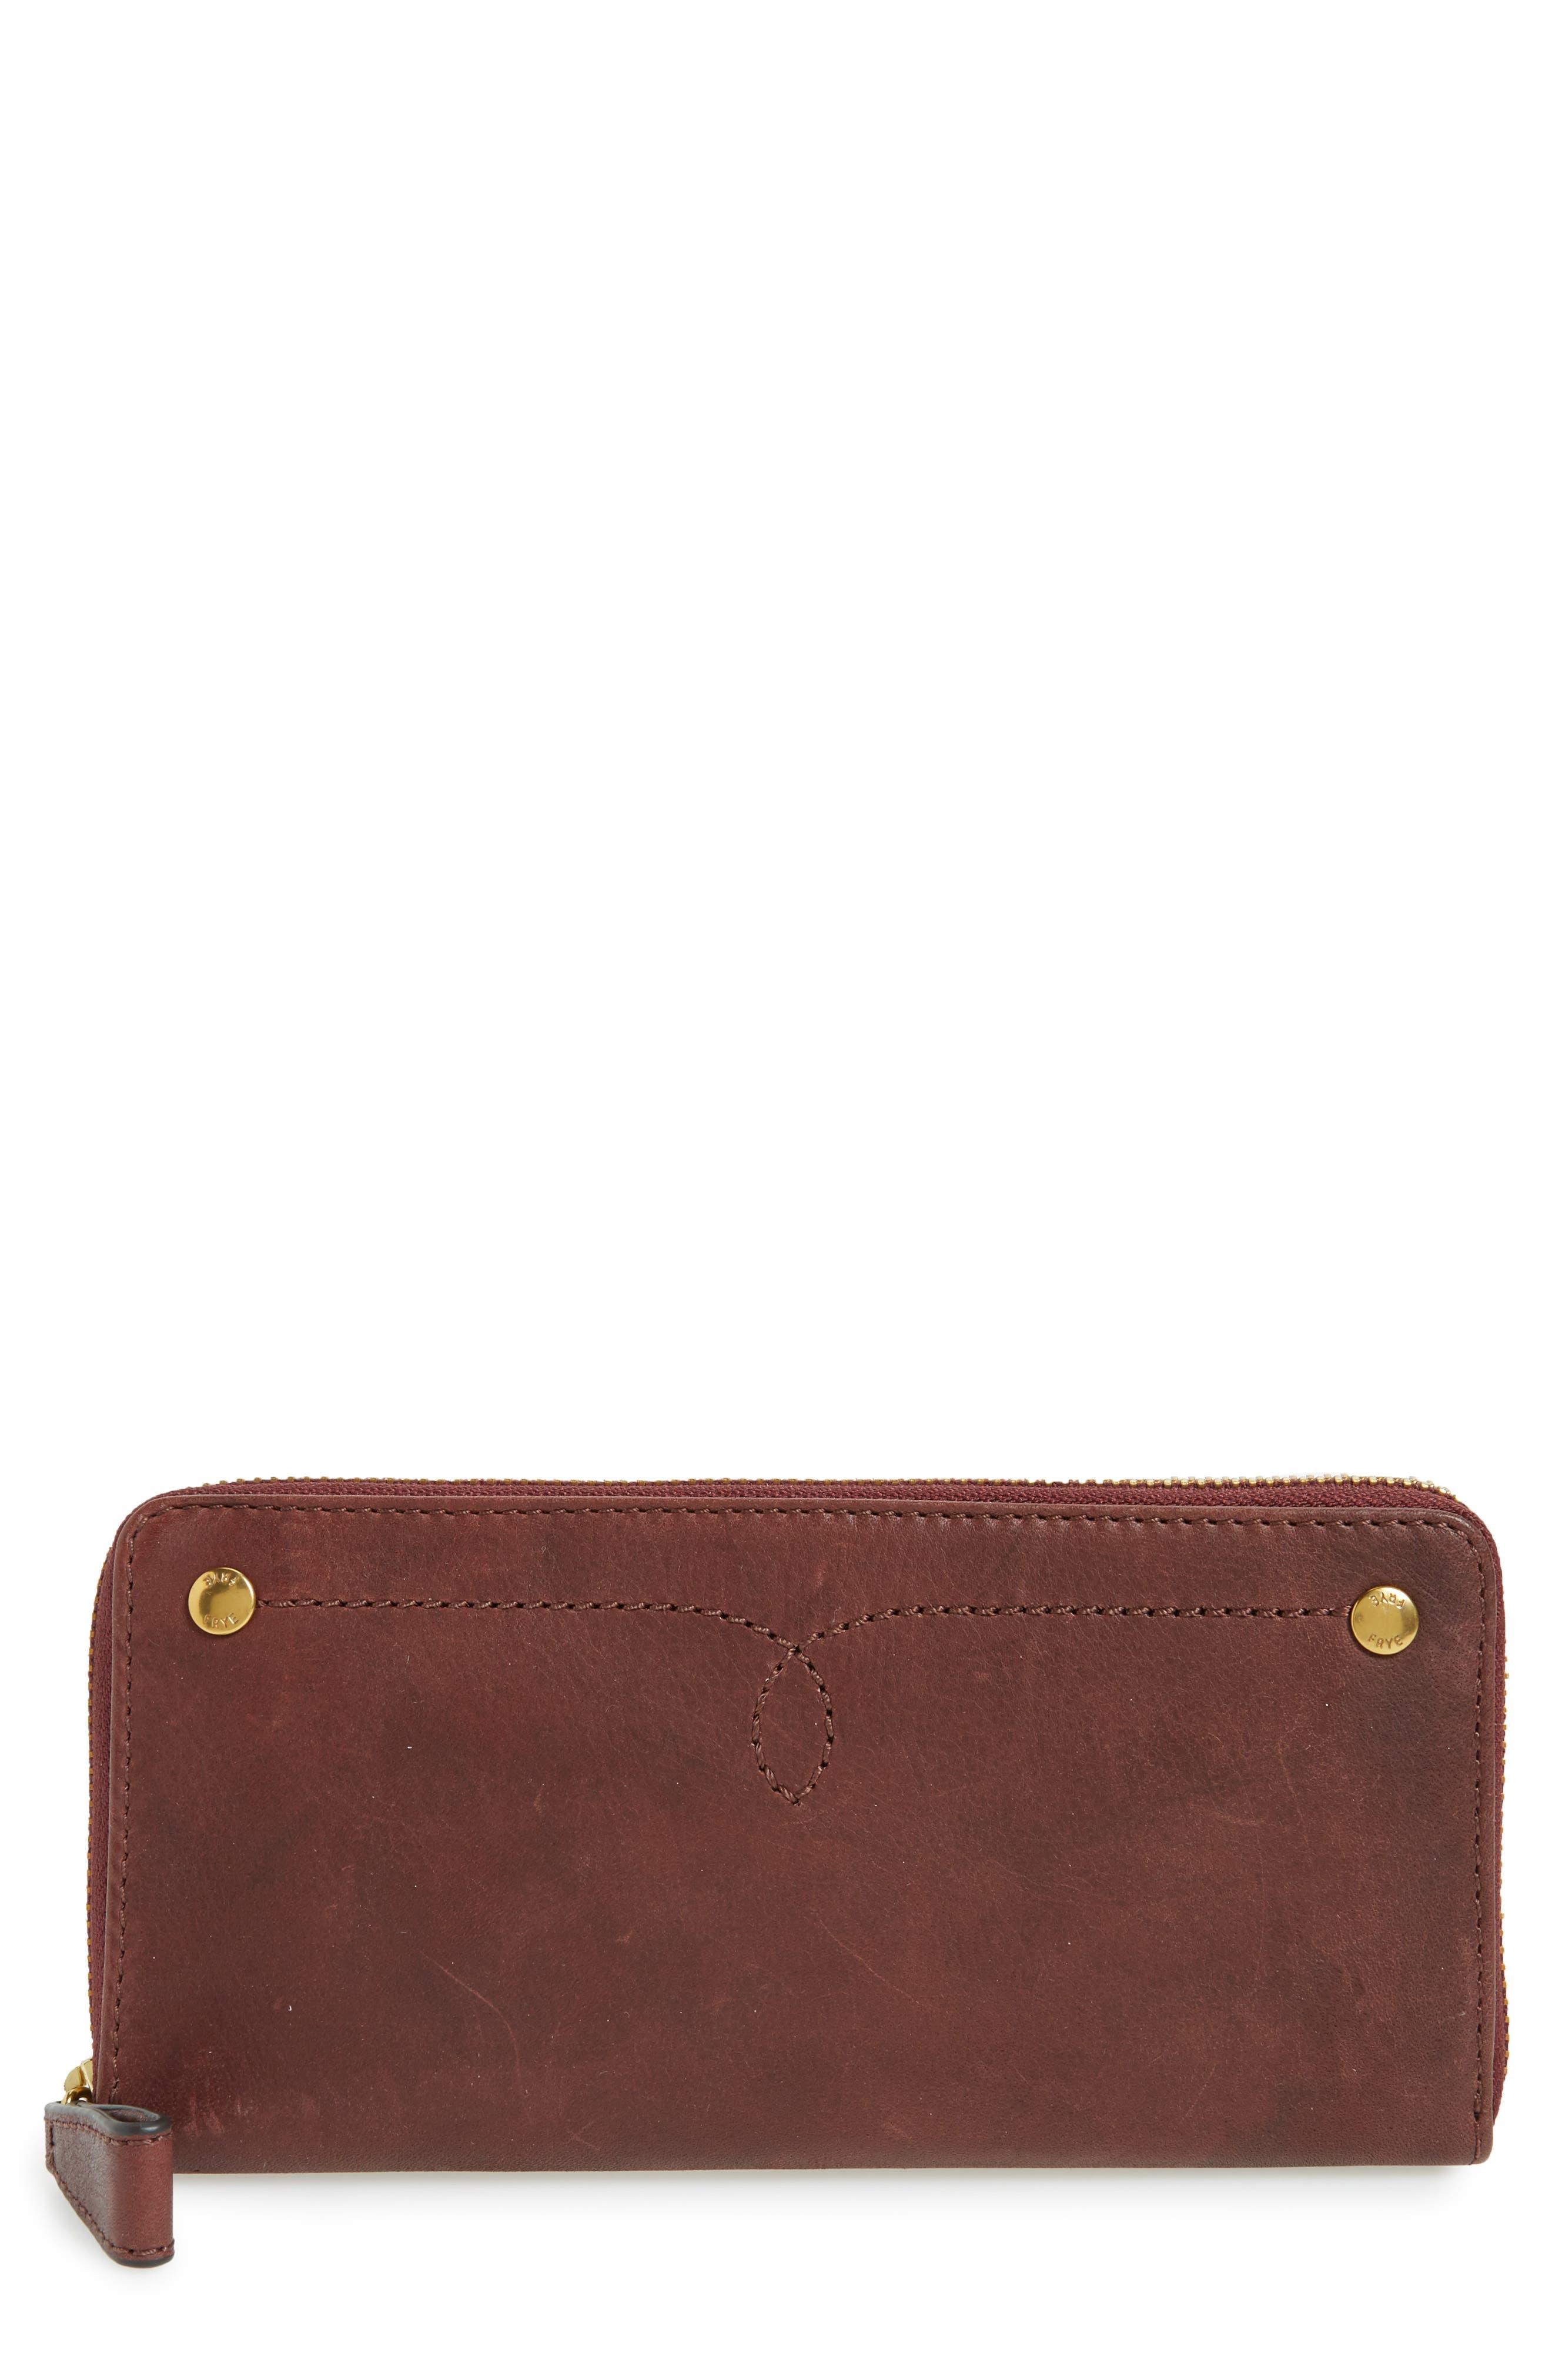 Alternate Image 1 Selected - Frye Campus Rivet Leather Continental Zip Wallet